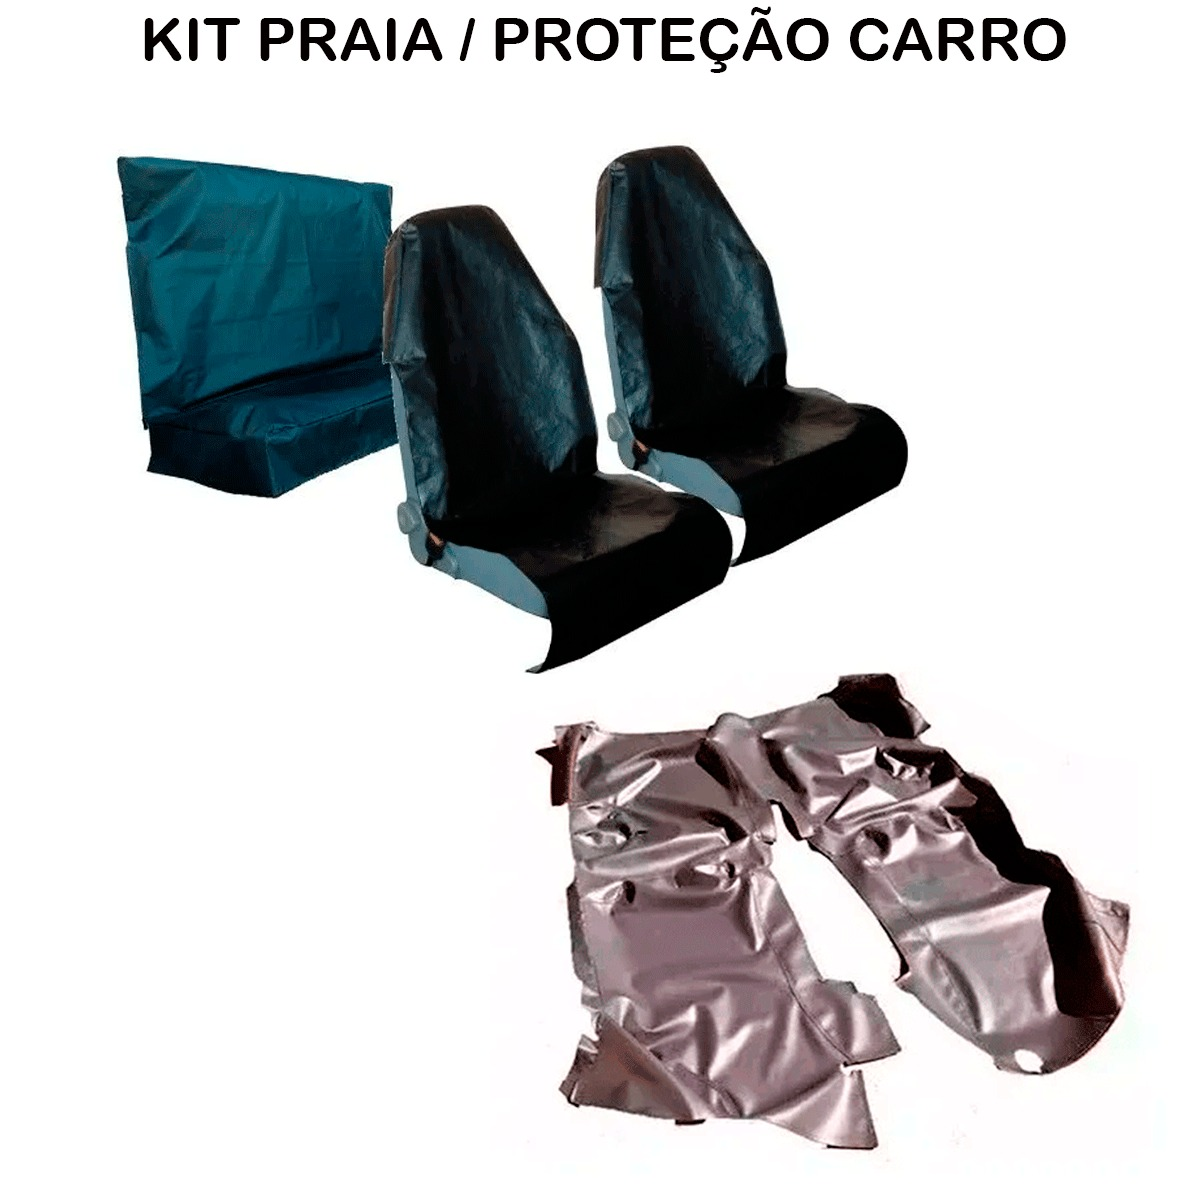 Tapete Em Vinil Volkswagen Santana 99 a 2005 + Capa Banco Protecao Banco Areia Suor Academia